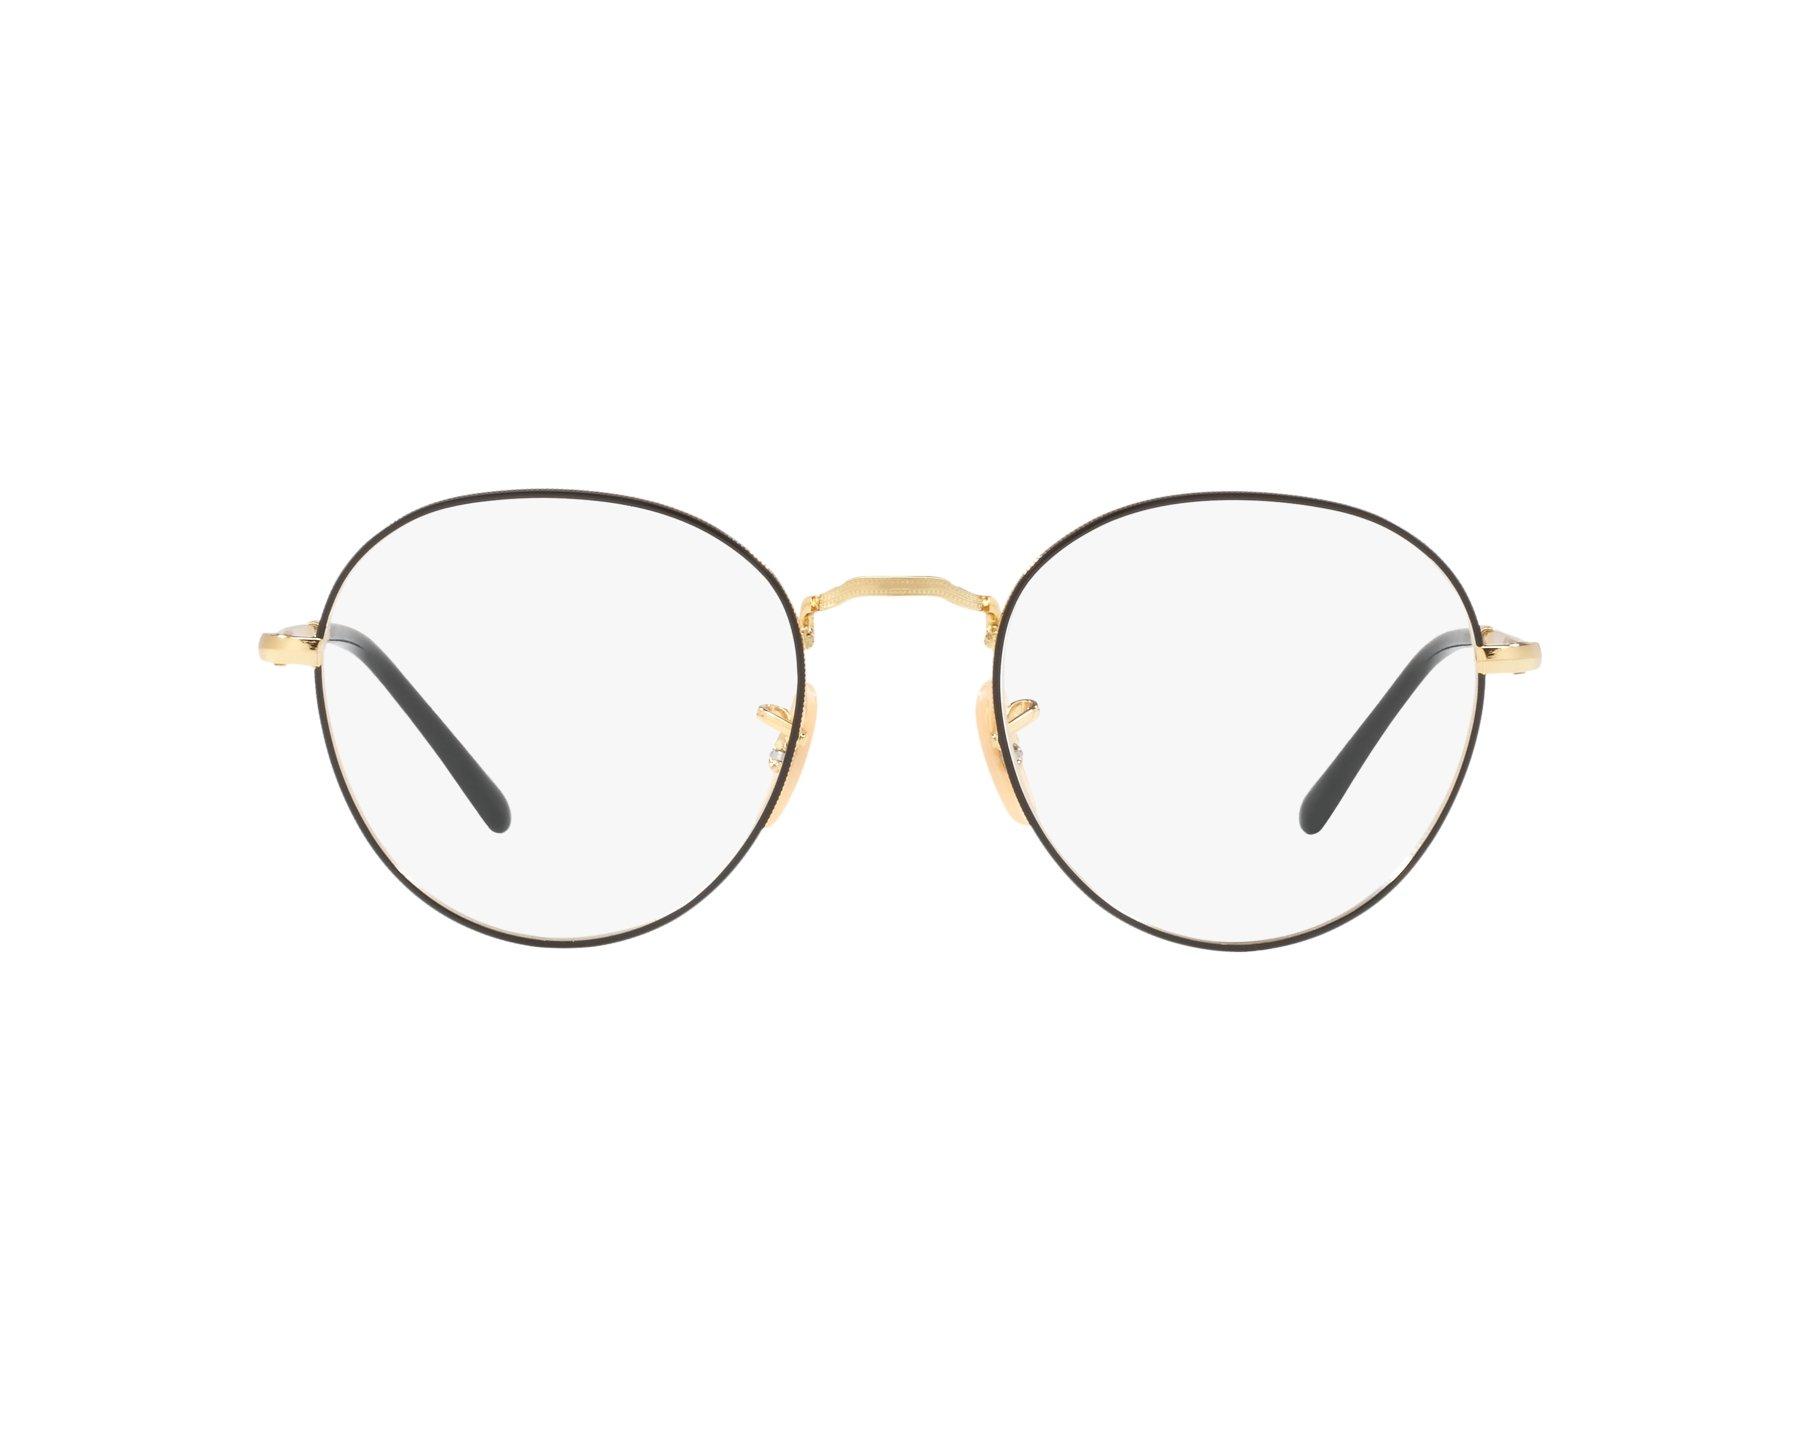 e54f2648d9 Brillen Ray-Ban RX-3582-V 2946 49-20 schwarz gold 360